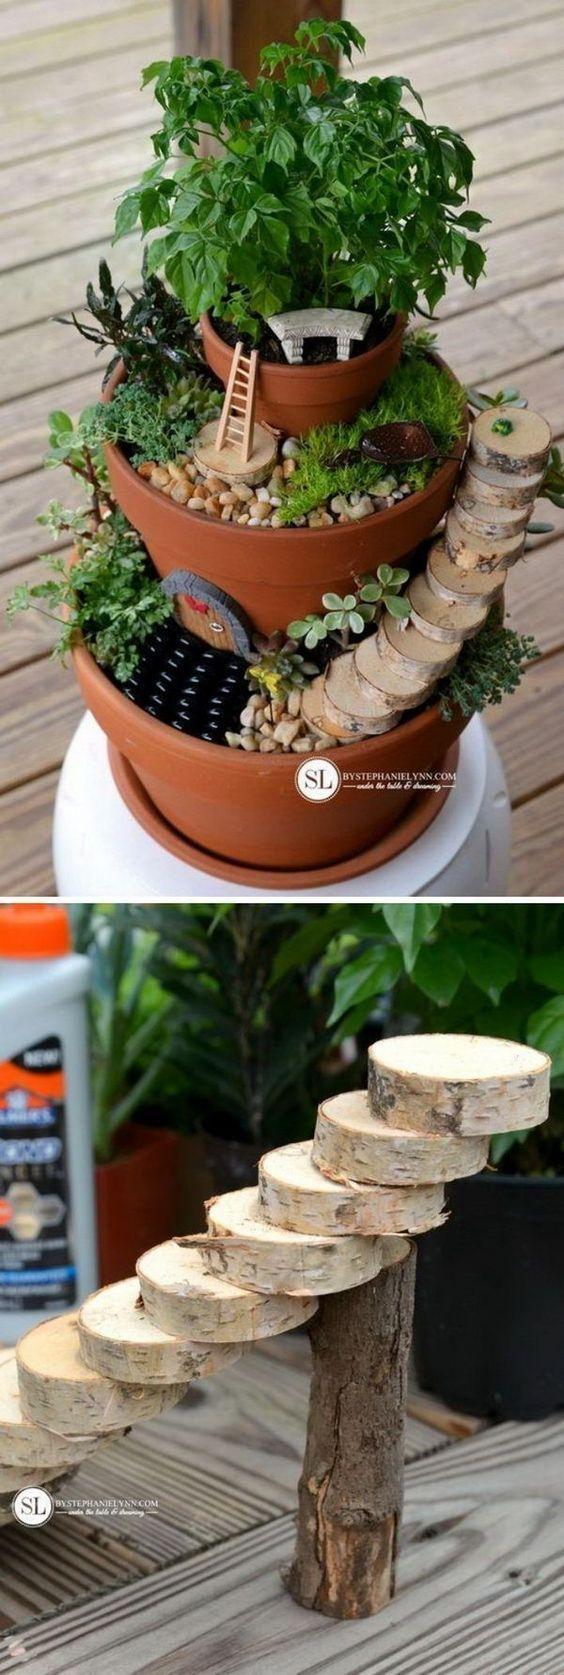 Over 15 DIY Outdoor Miniature Fairy Garden Ideas for Kids in the Garden -   Awesome miniature fairy garden ideas